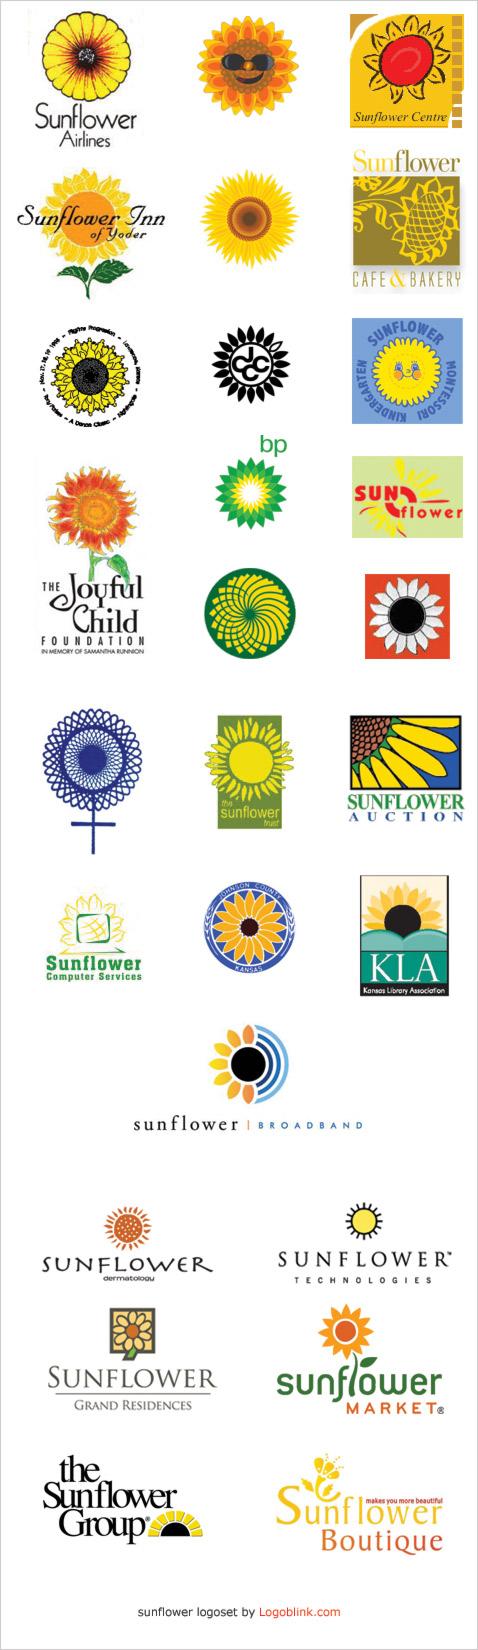 Sunflower Logo Design Pinterest Sunflowers Logos And Logo Ideas